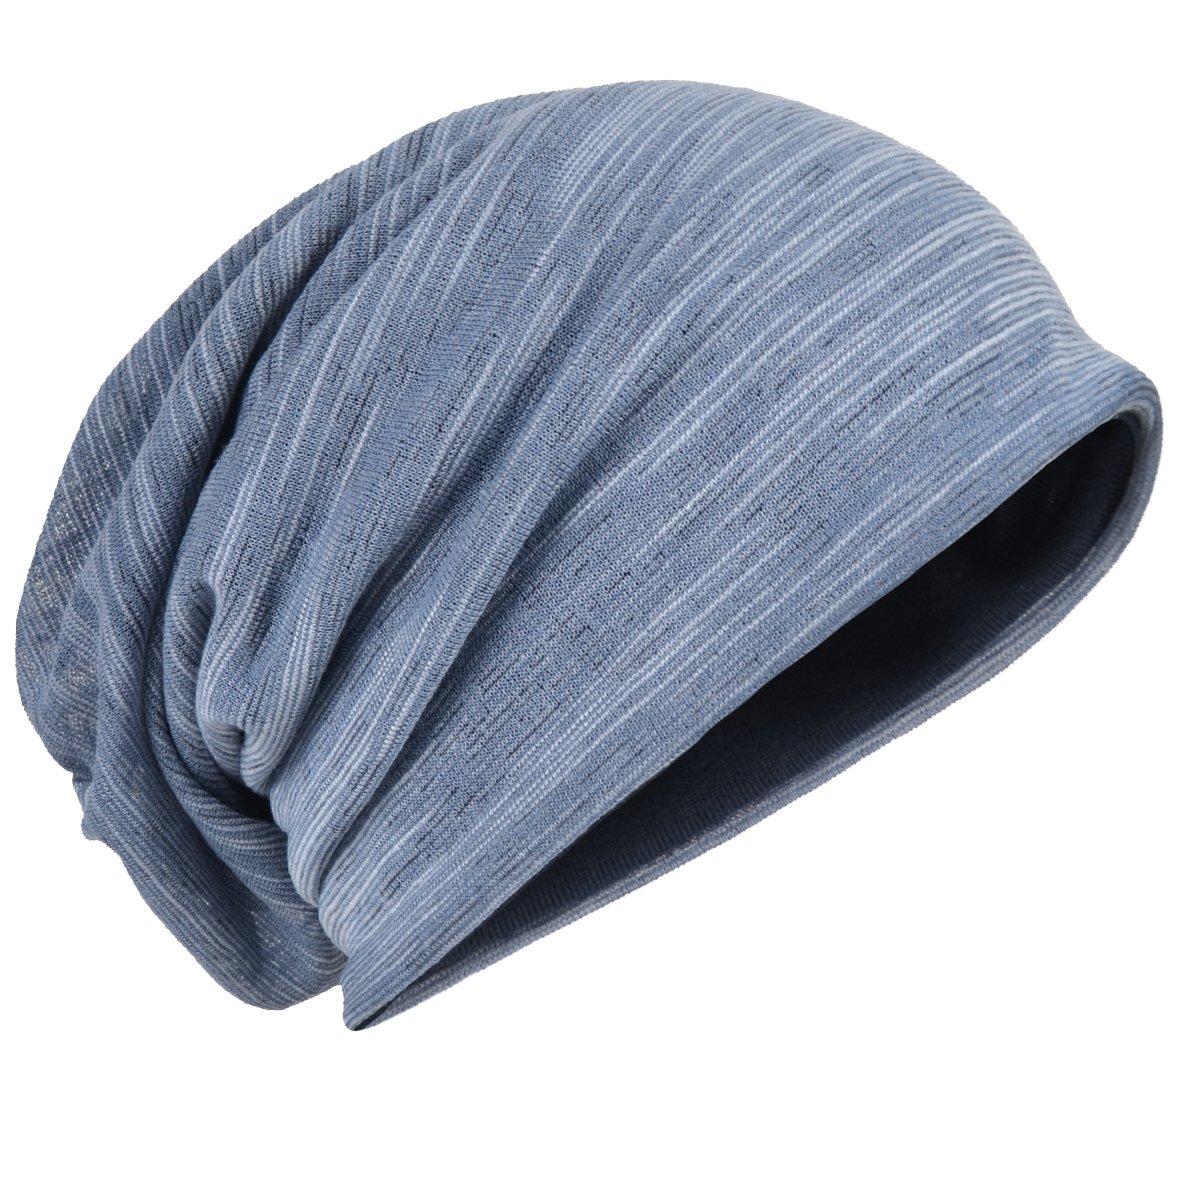 Men Slouch Hollow Beanie Thin Summer Cap Skullcap B011h (Bluish)